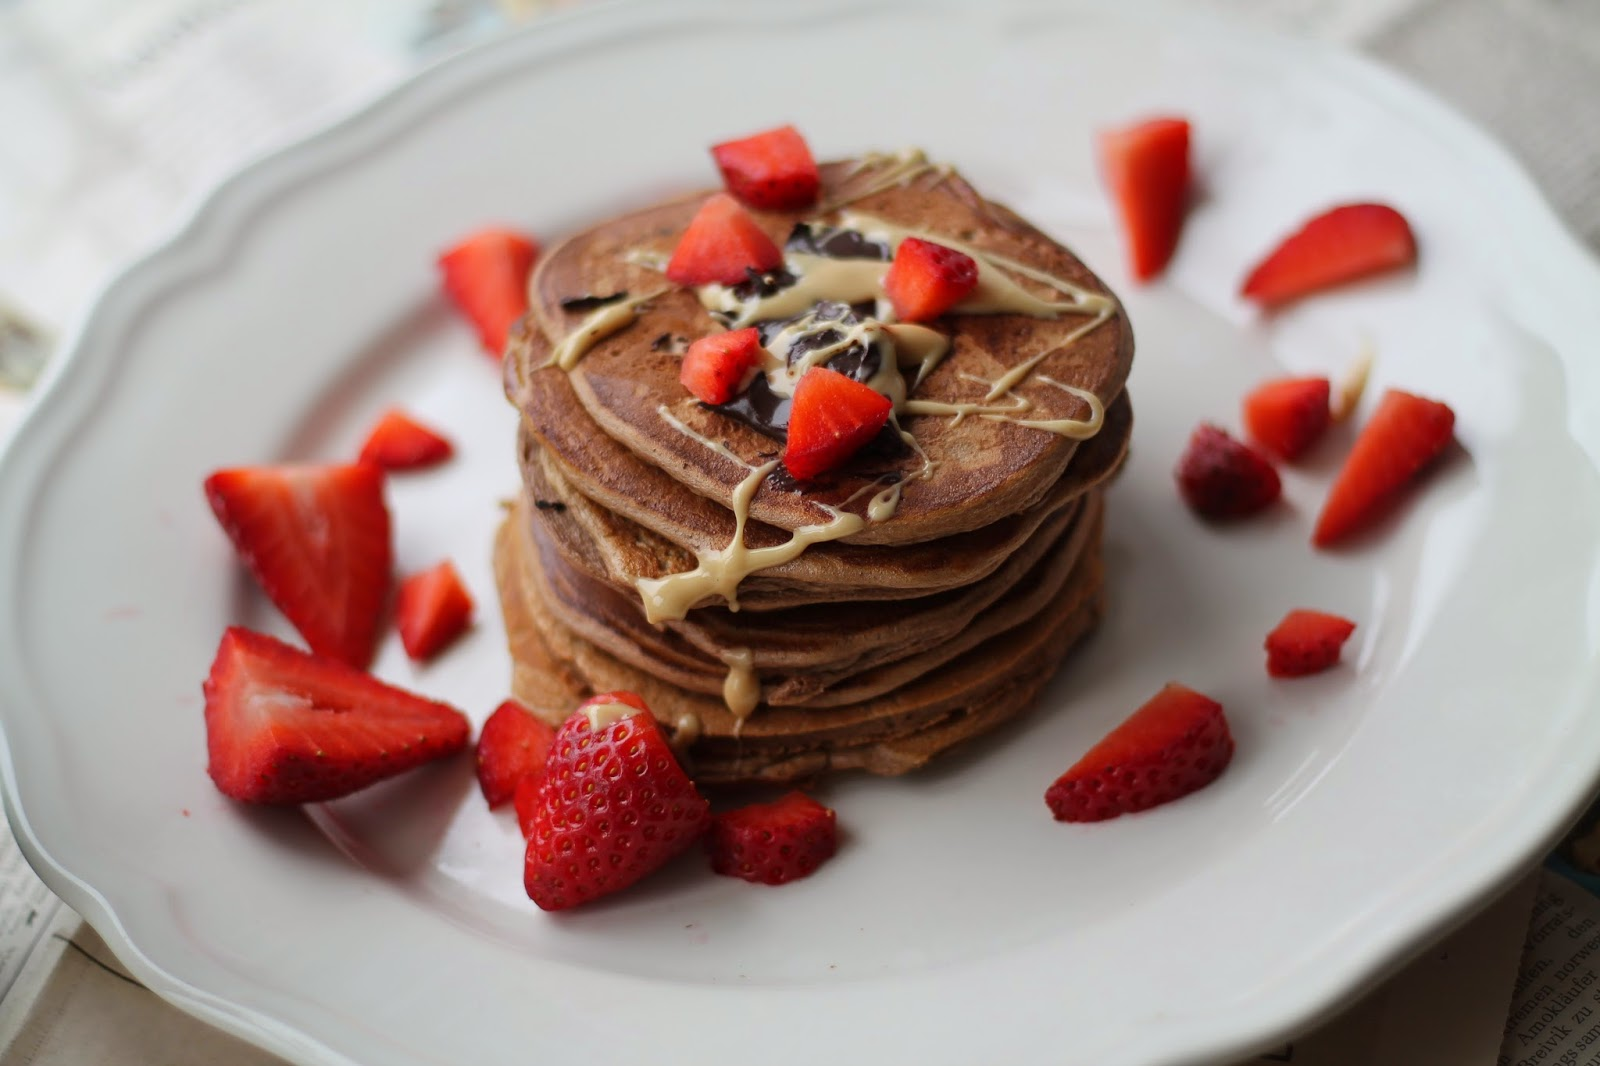 Pancakes Rezept Recipe / #svetlanakocht / Gesunde Ernährung / clean eating / Heatlyh Recipe / gesundes Rezept für Pancakes